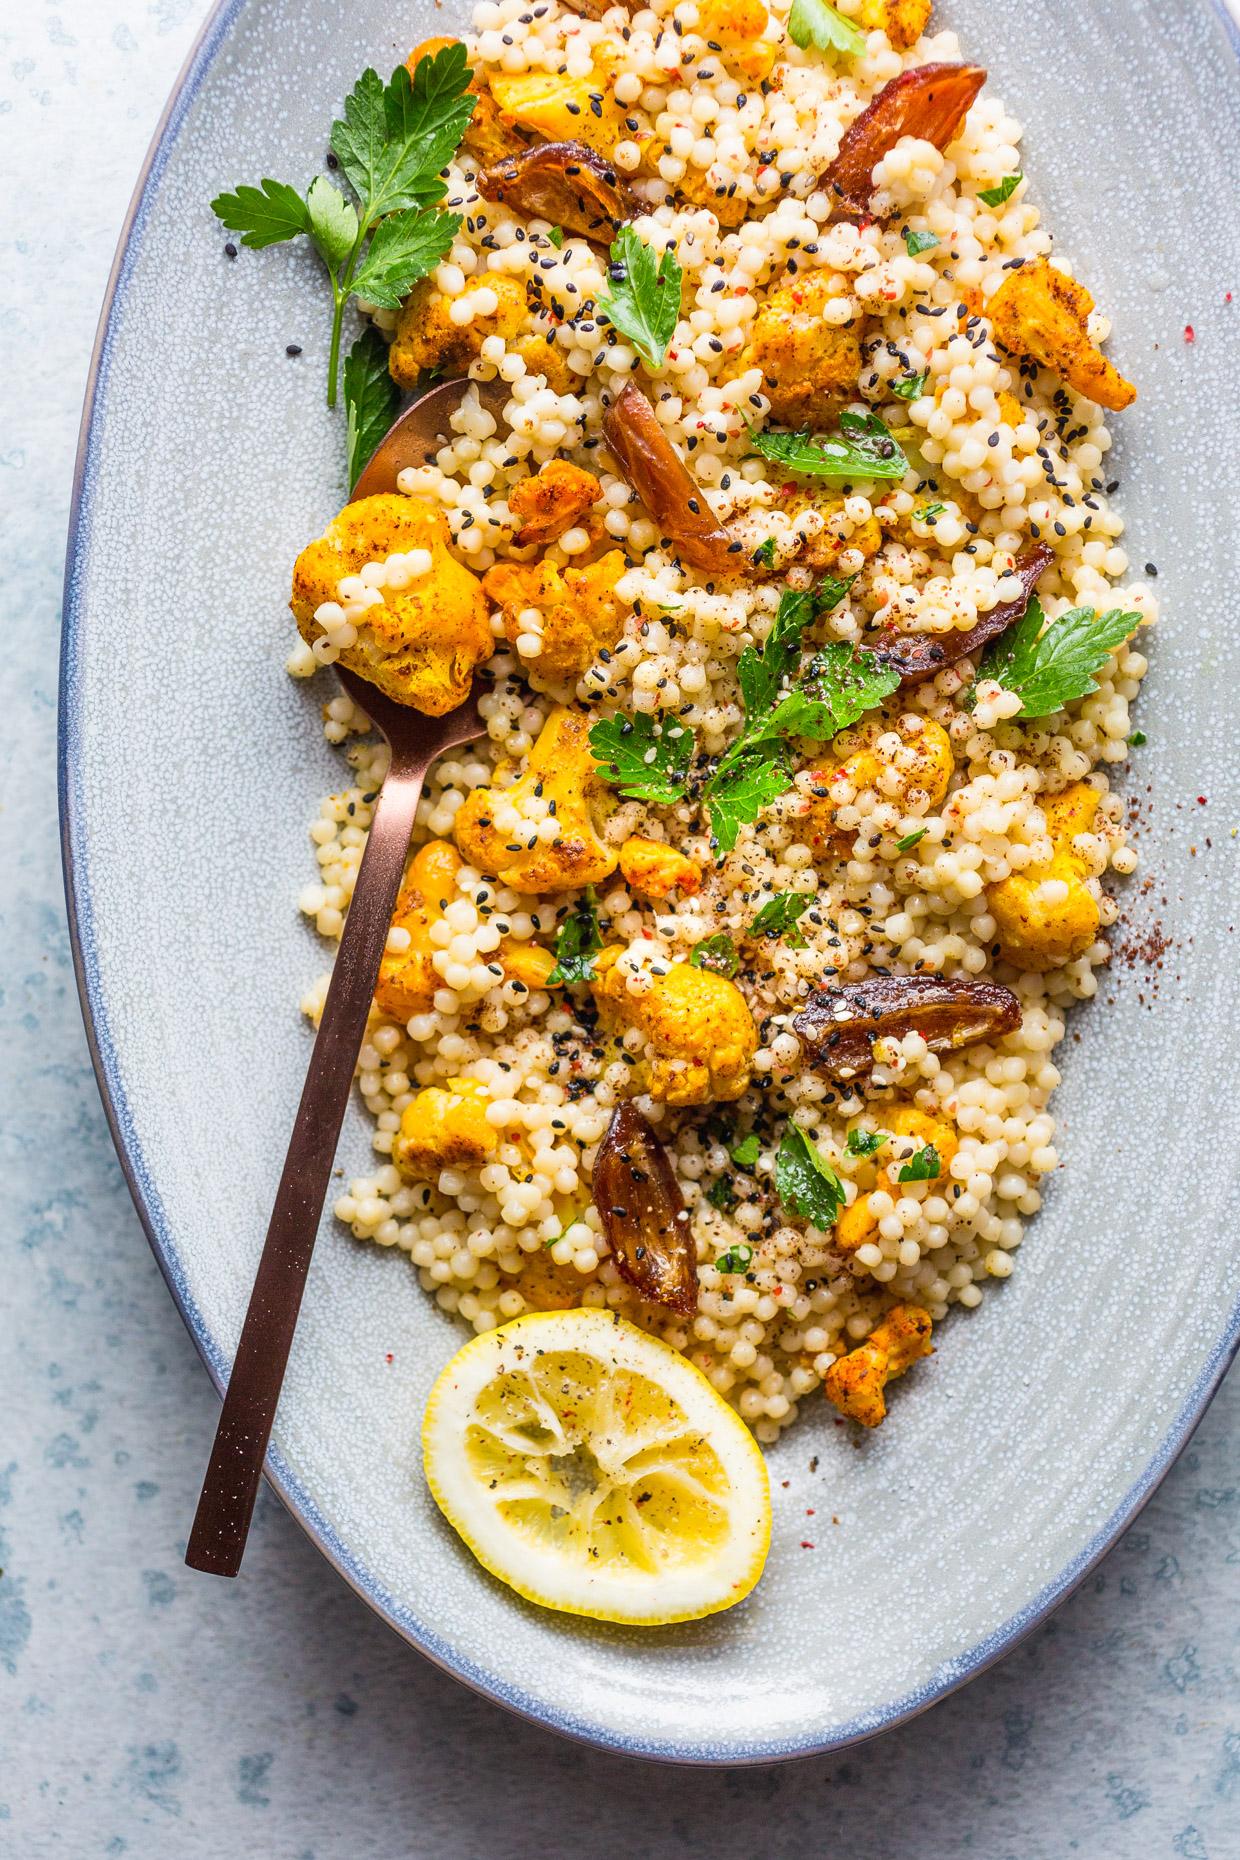 Roasted Cauliflower & Dates Couscous Salad with Creamy Tahini